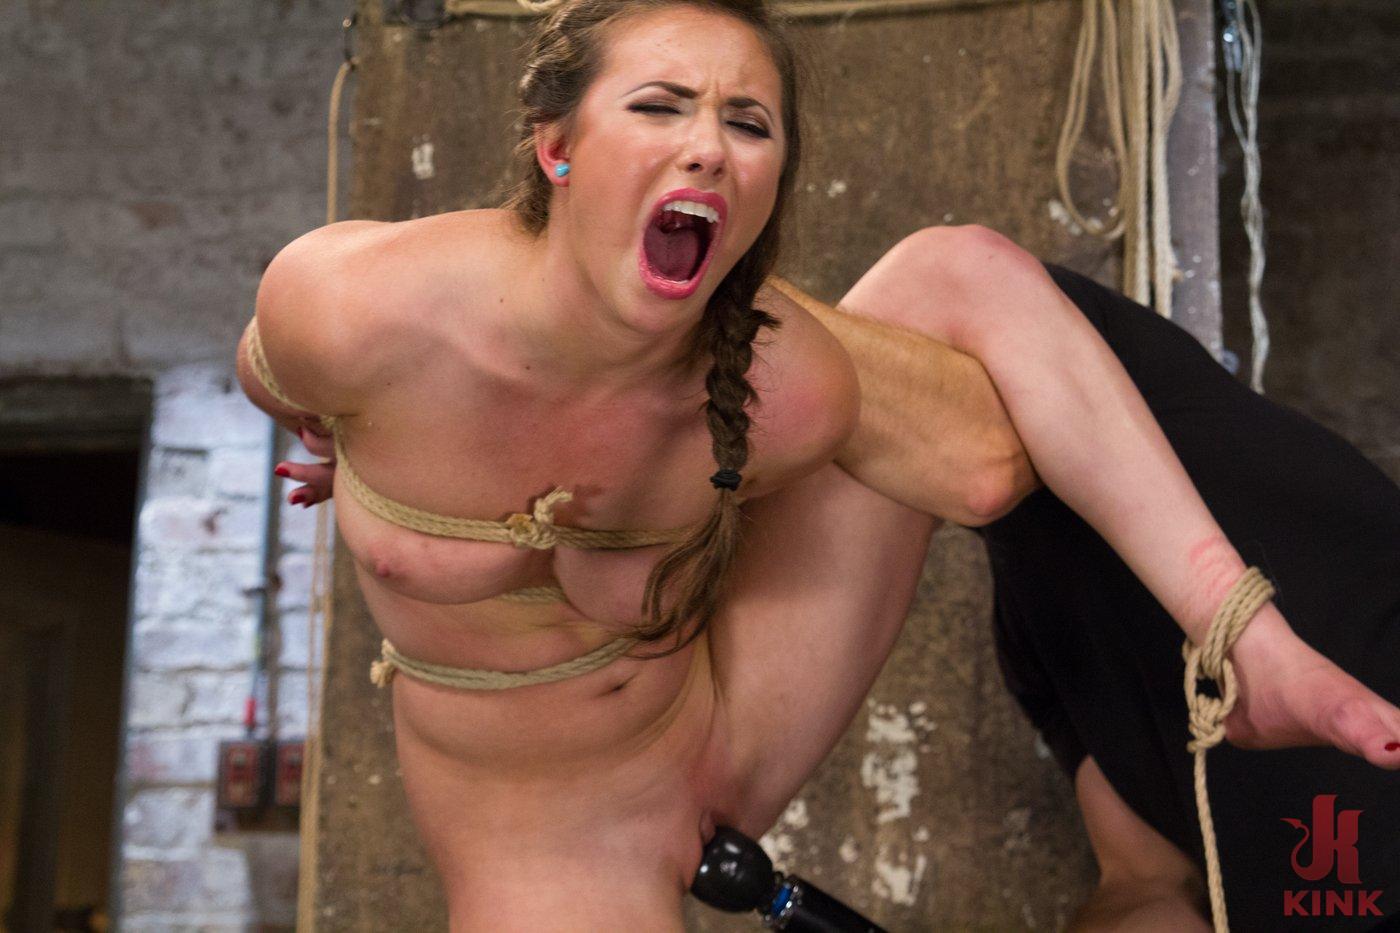 Gay gloryhole porn video